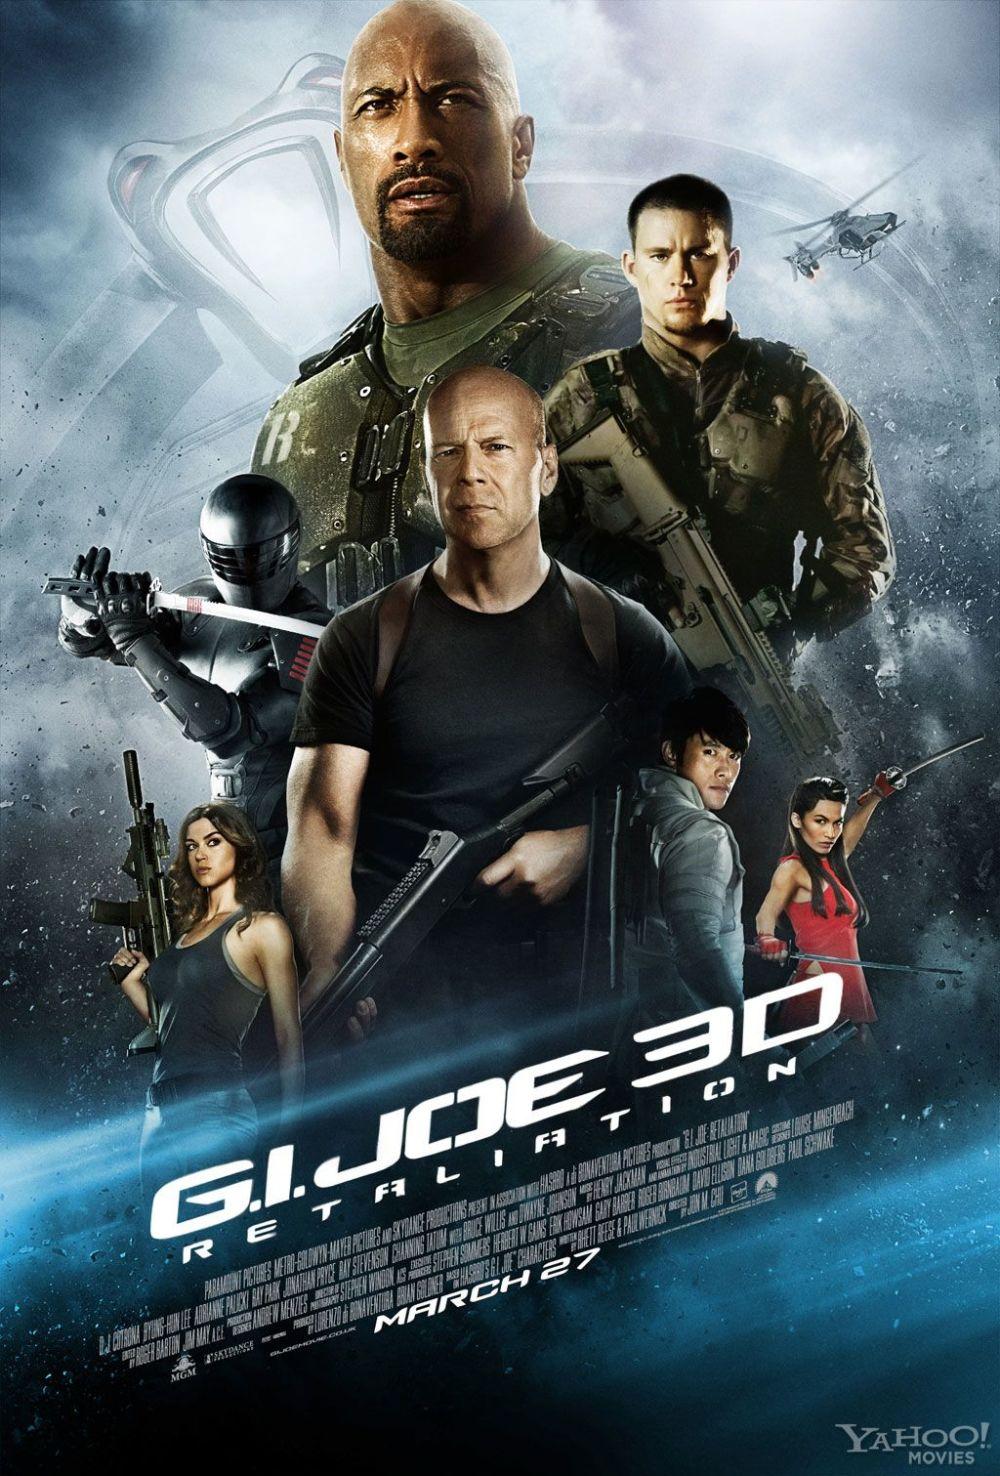 Poster uitgestelde 'G.I. Joe 3D: Retaliation'